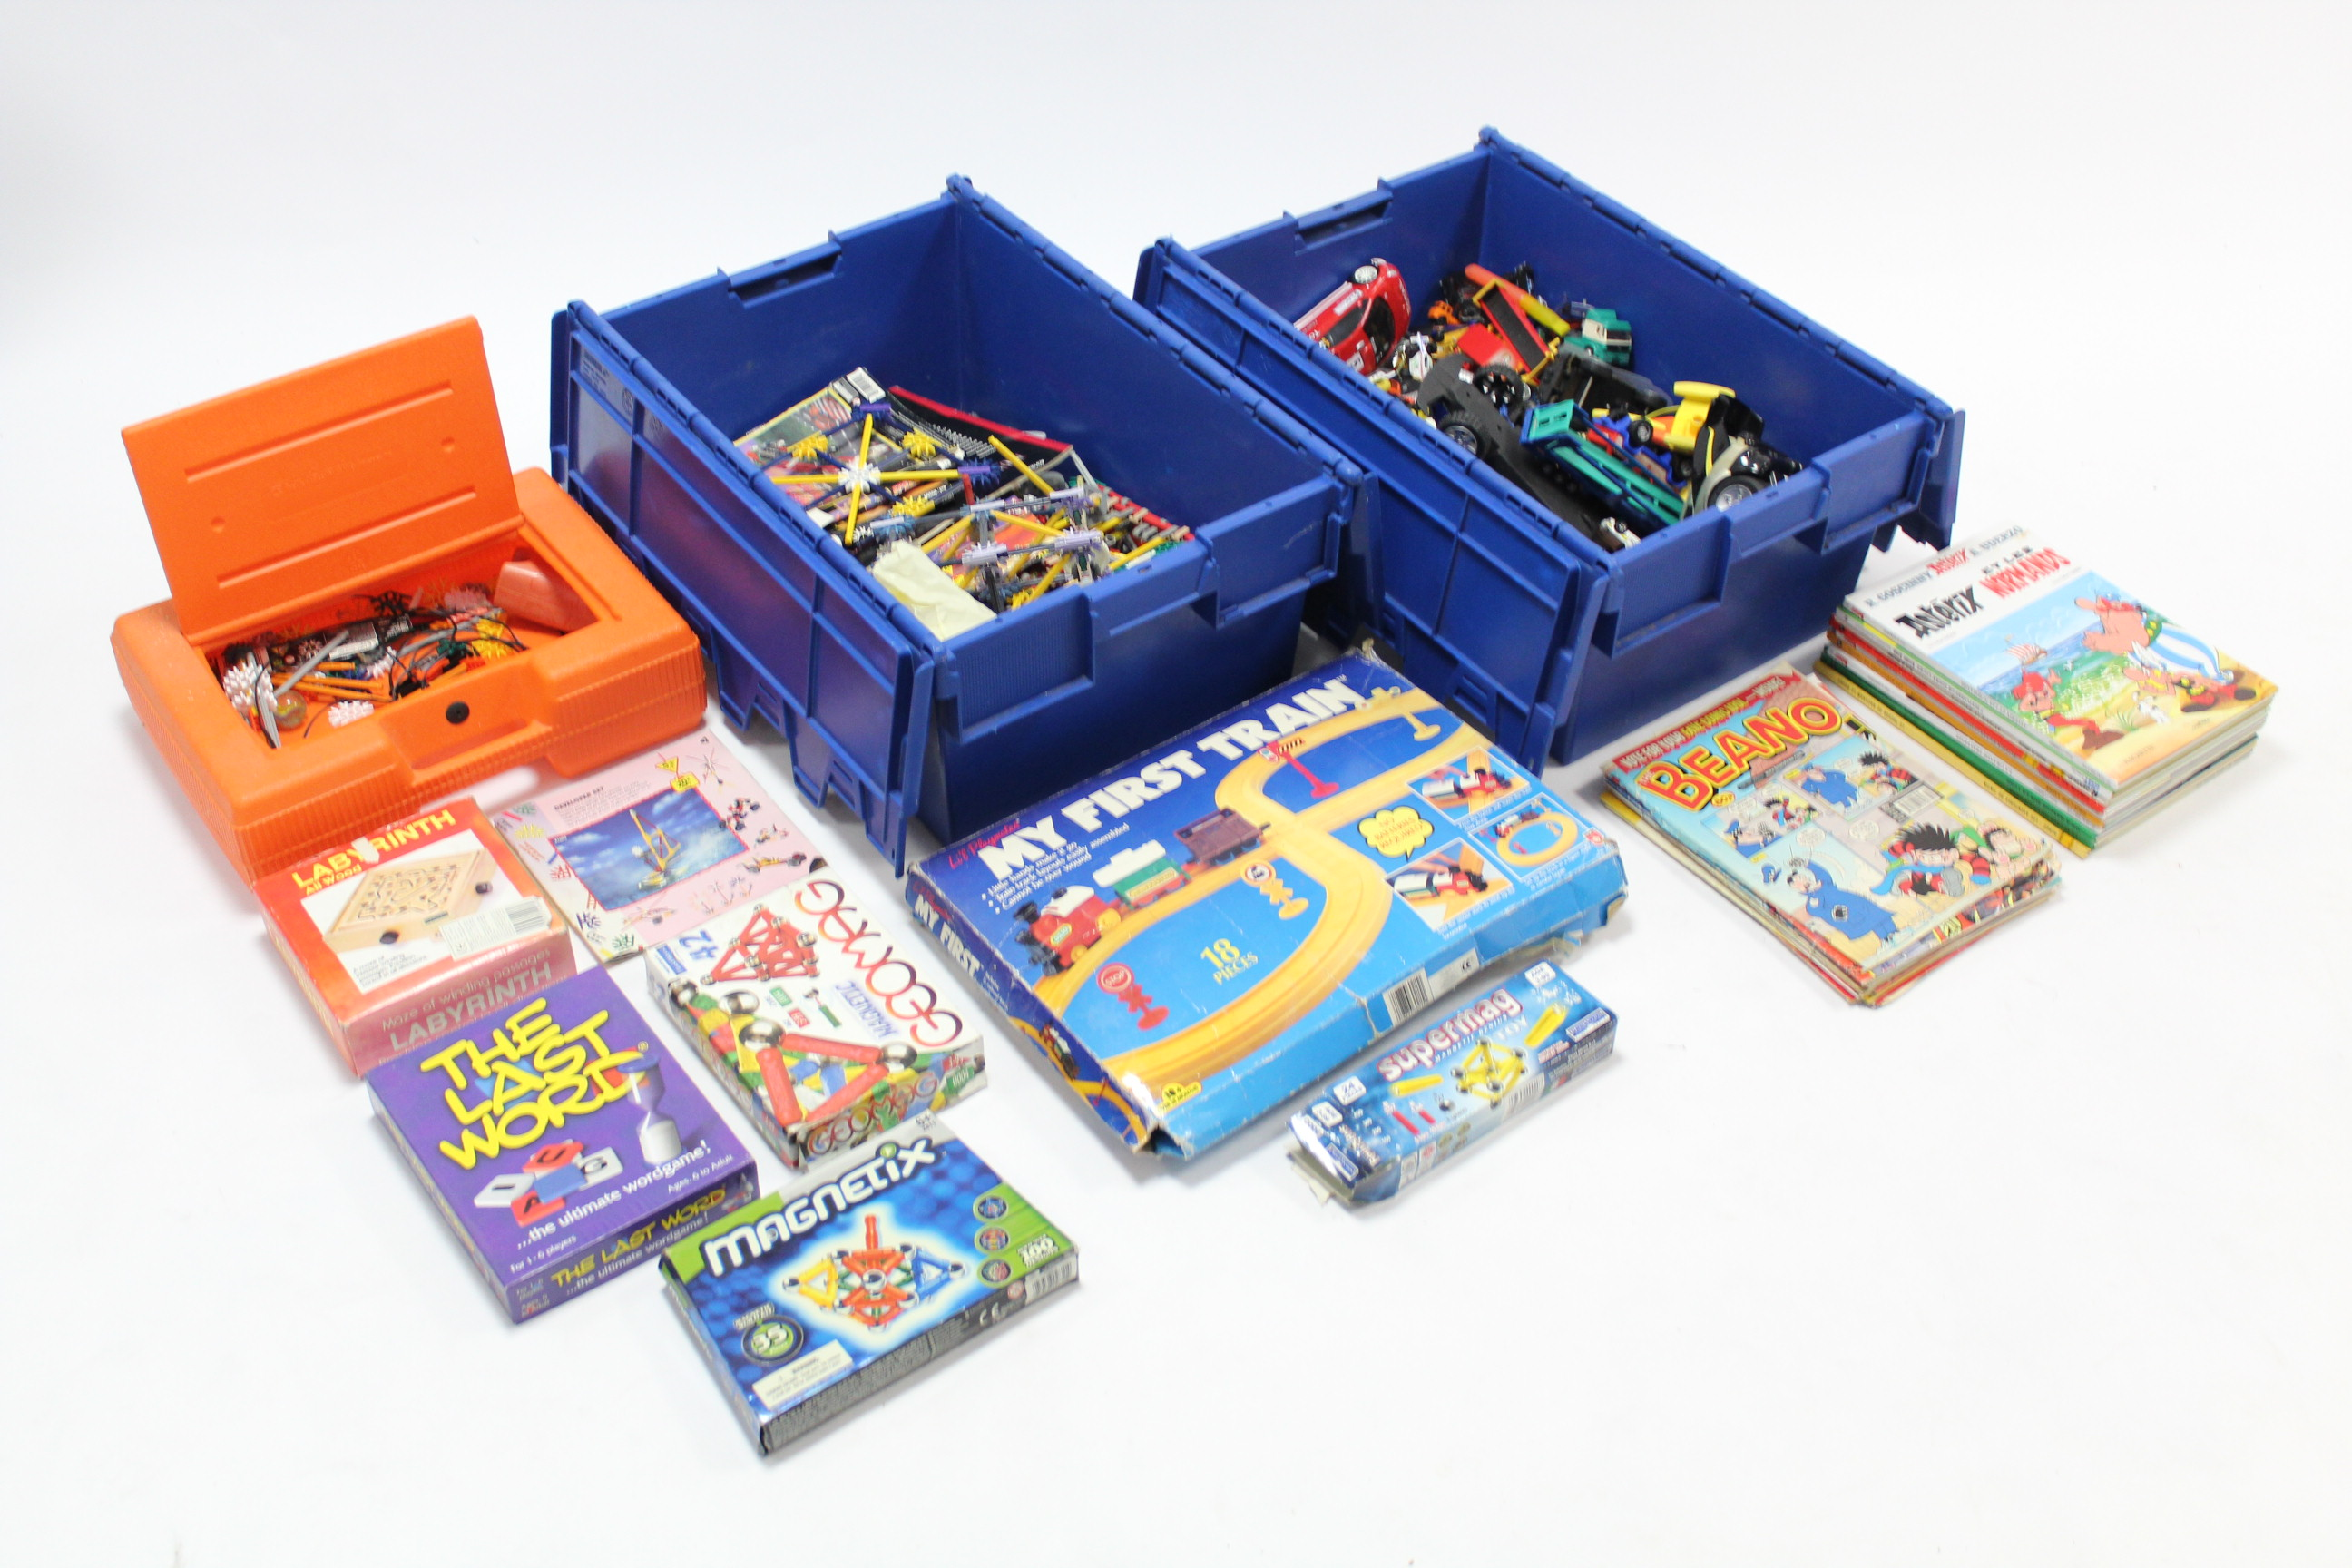 Lot 20 - Various children's toys, comics, books, etc.